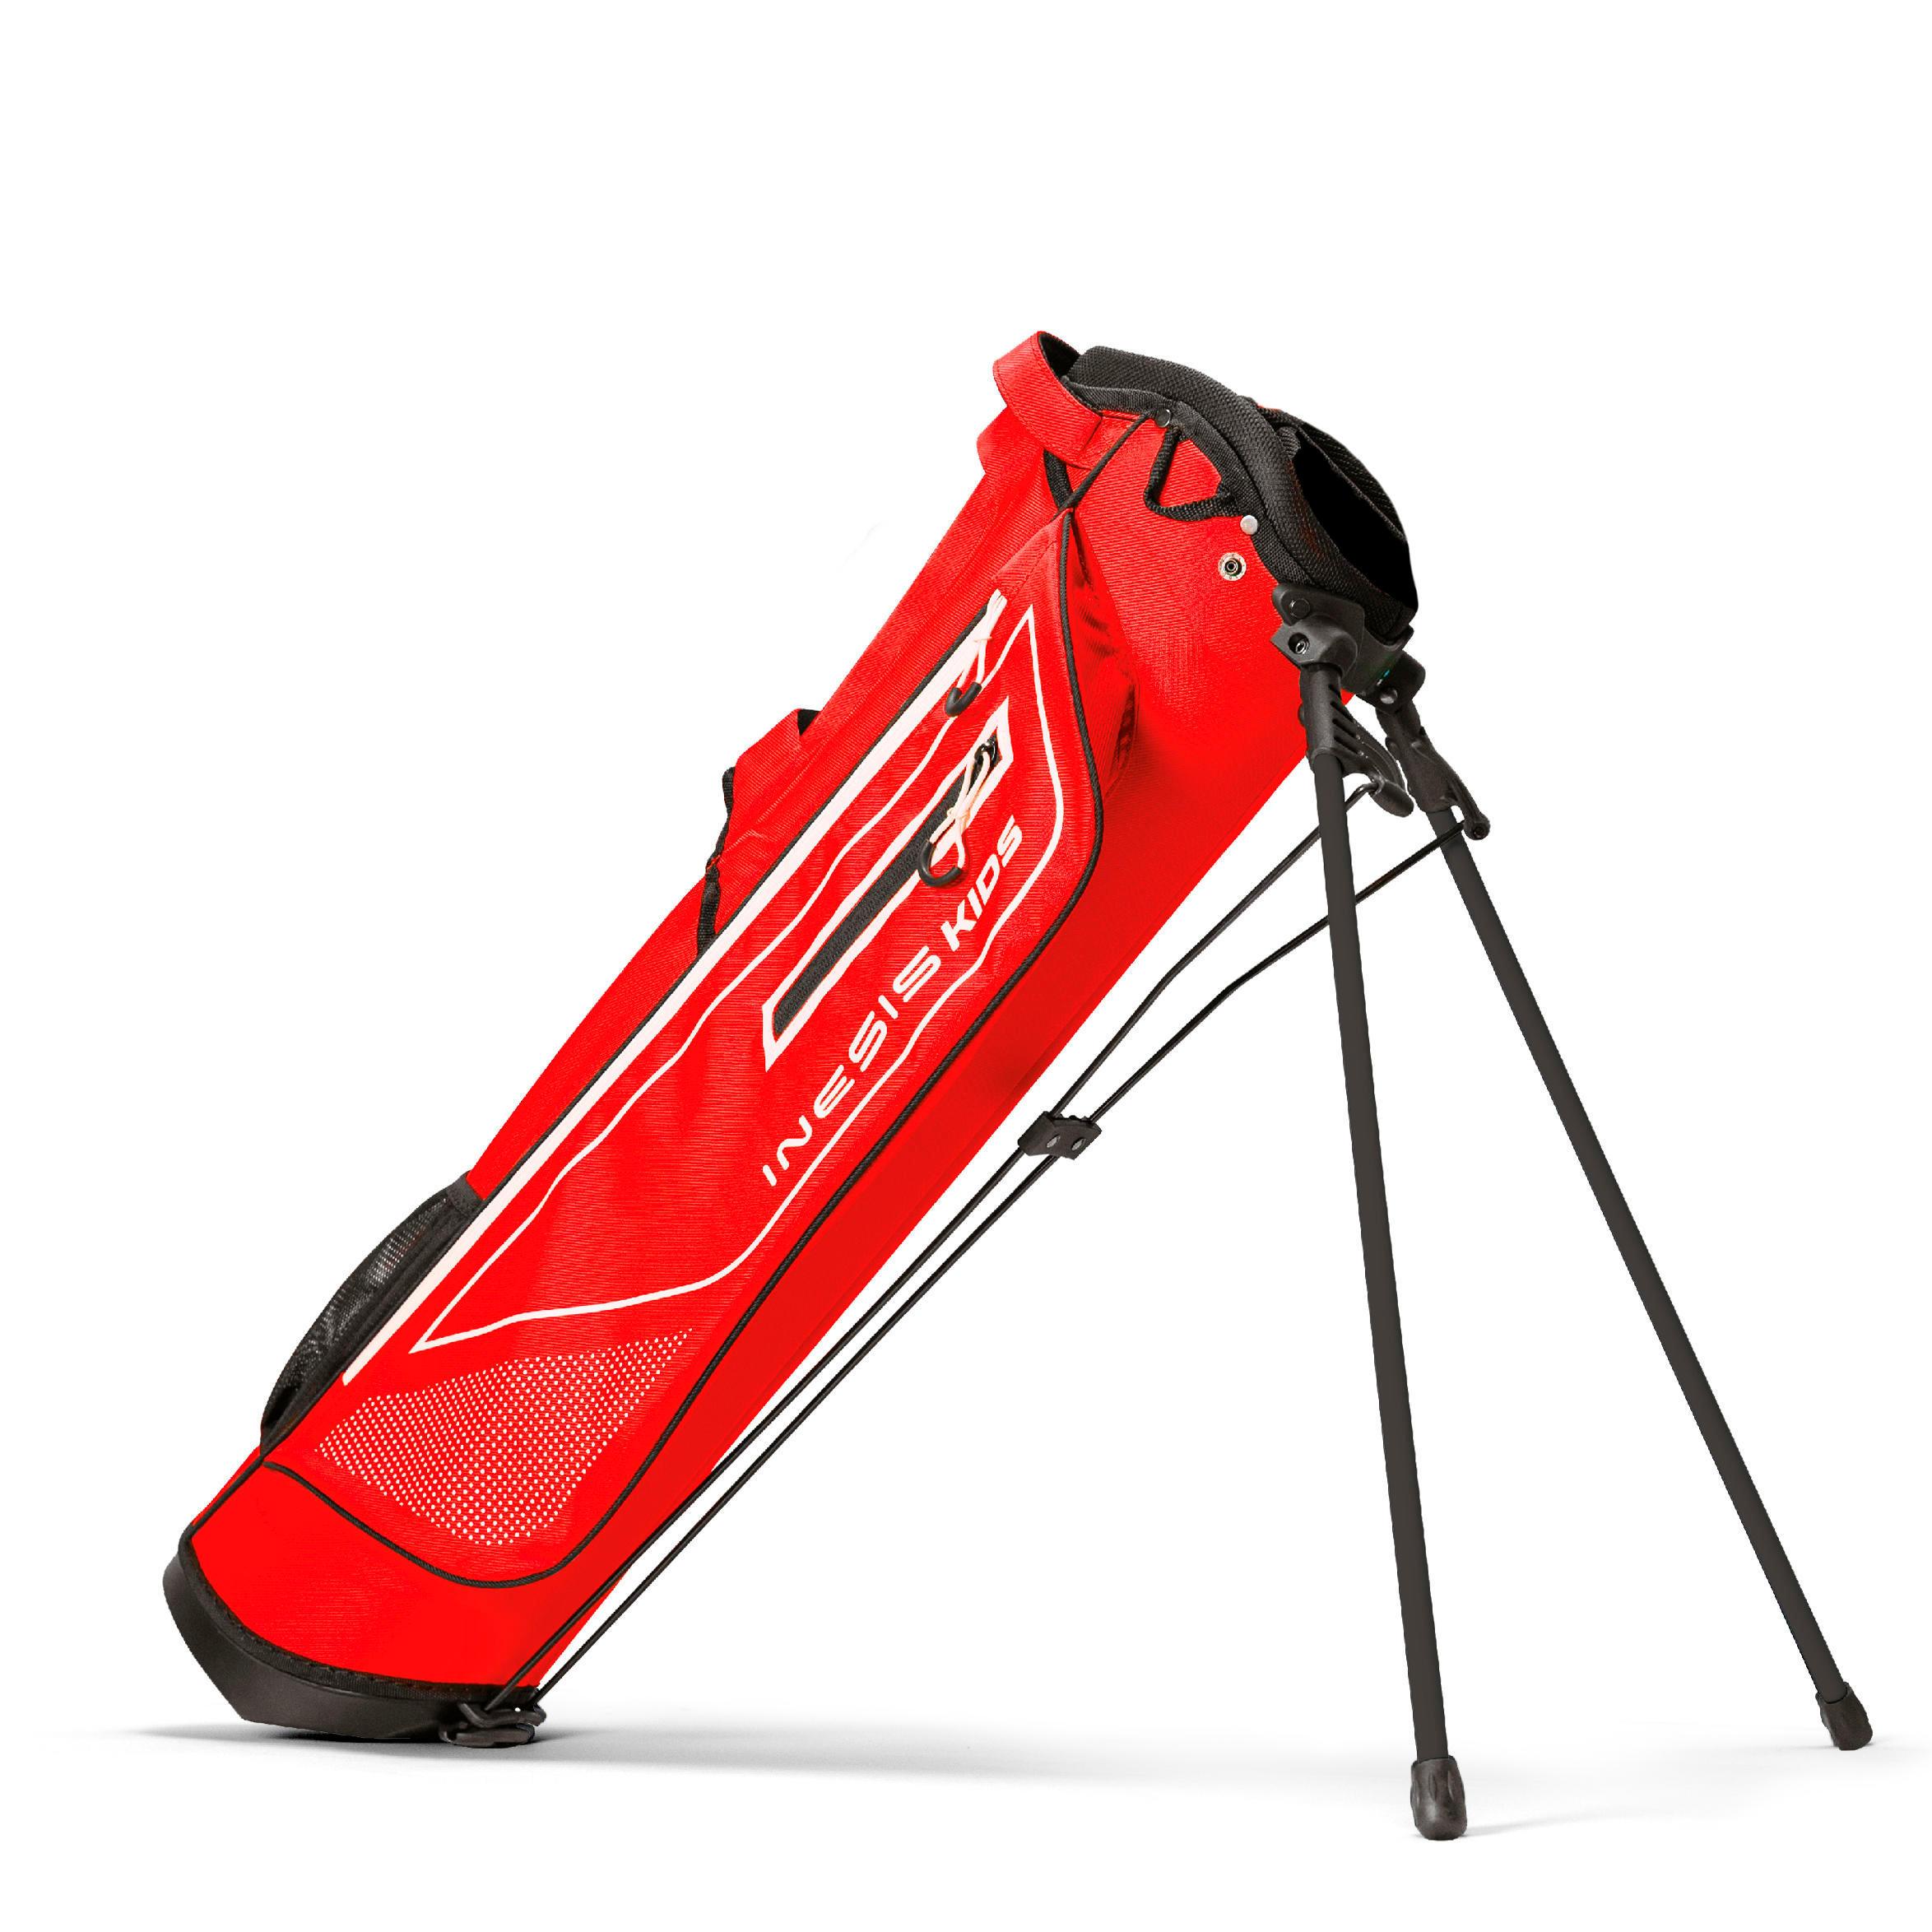 Inesis Sac de golf 8-10 ans - Inesis